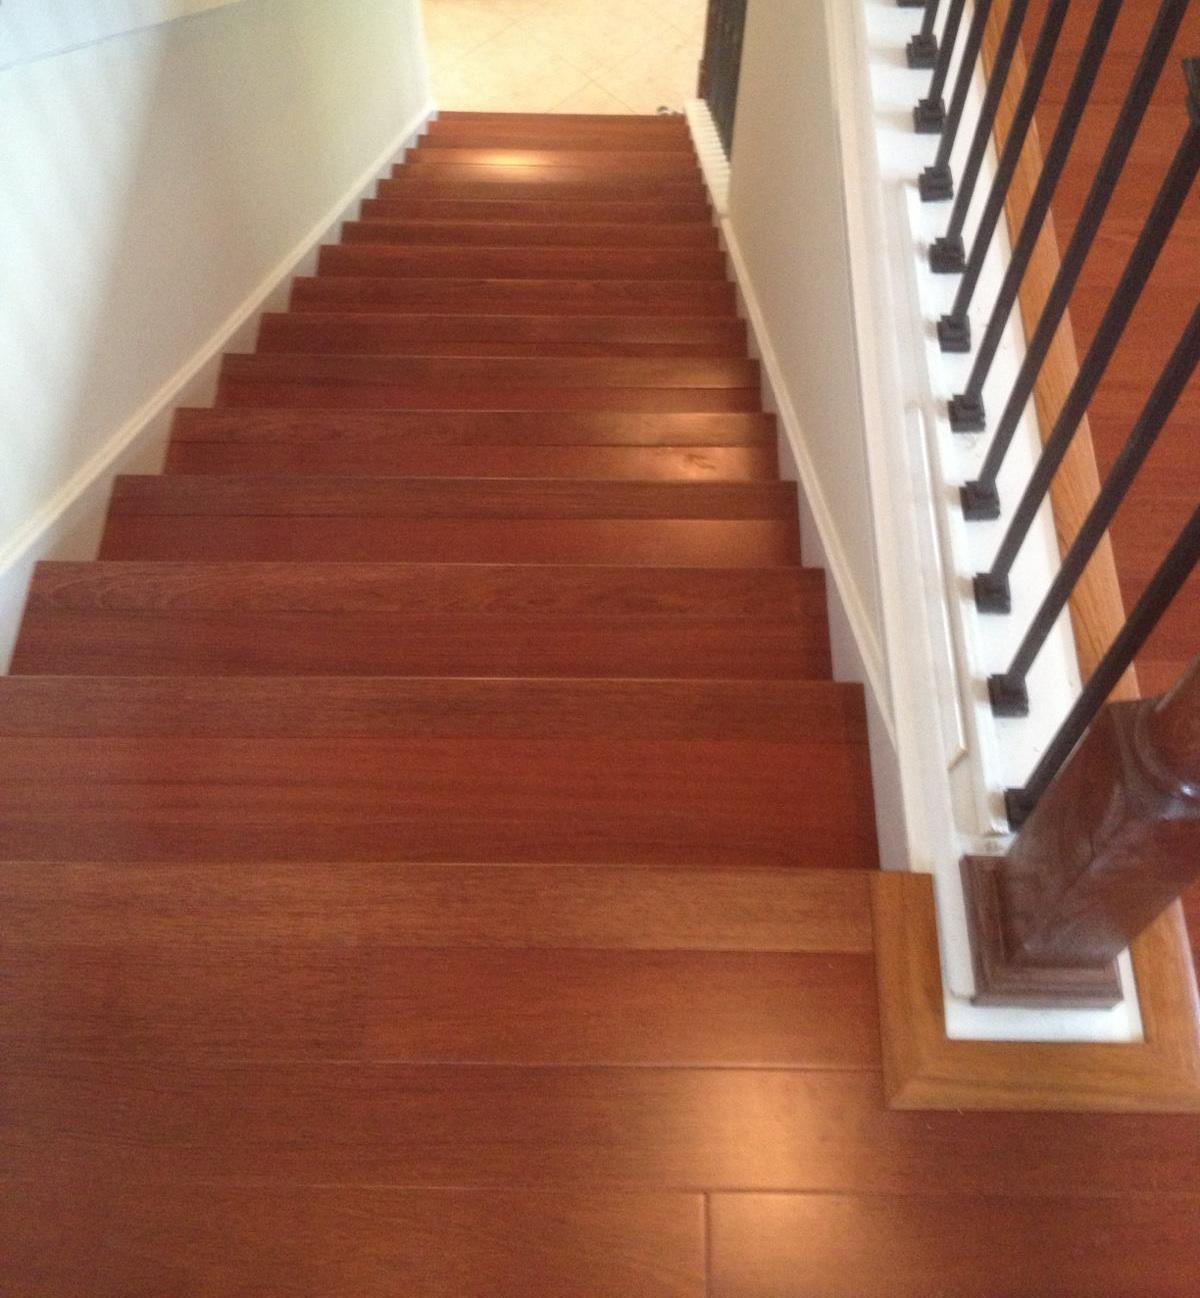 Designer Lifestyles LLC - Flooring Store image 2